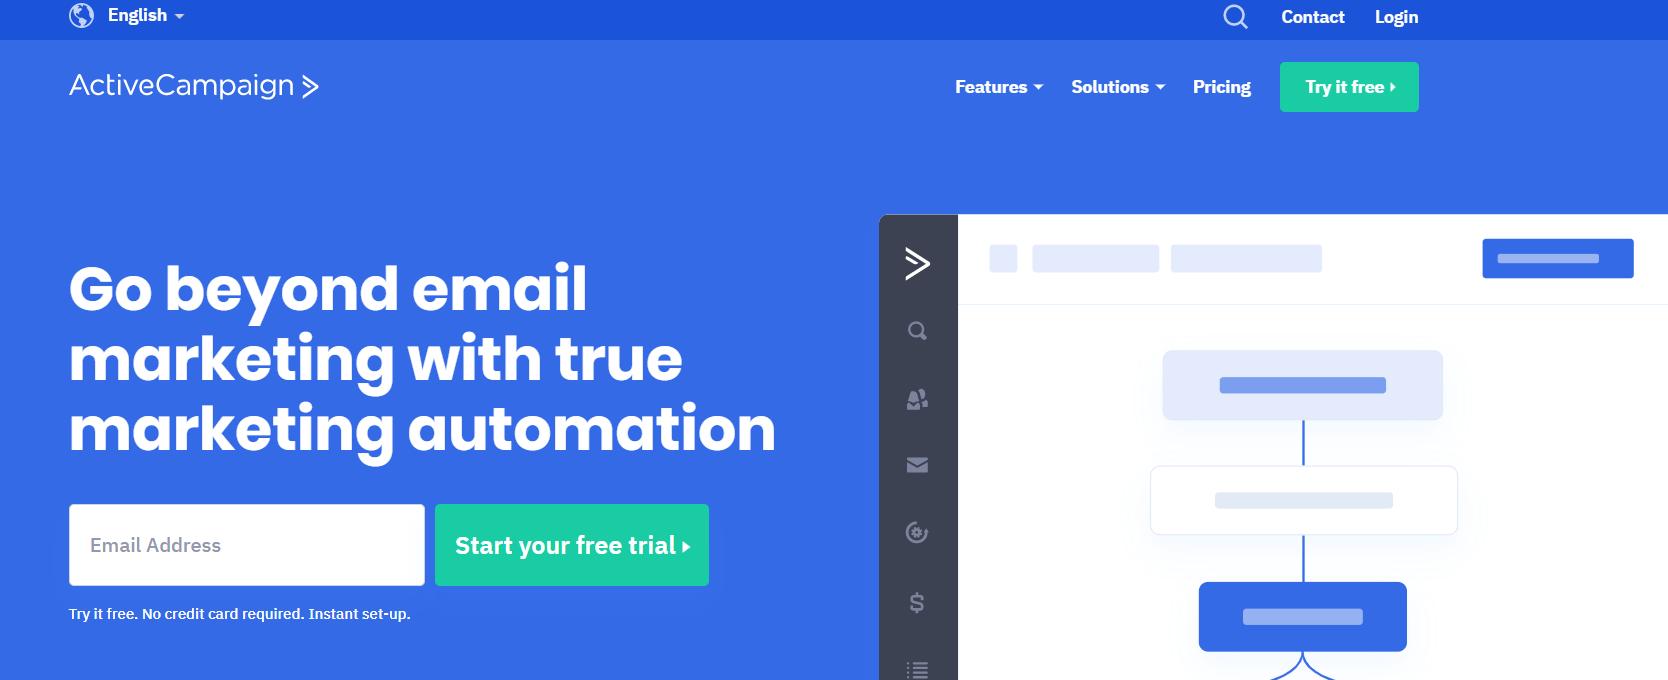 Omnisend Vs Mailchimp Comparison- ActiveCampaign